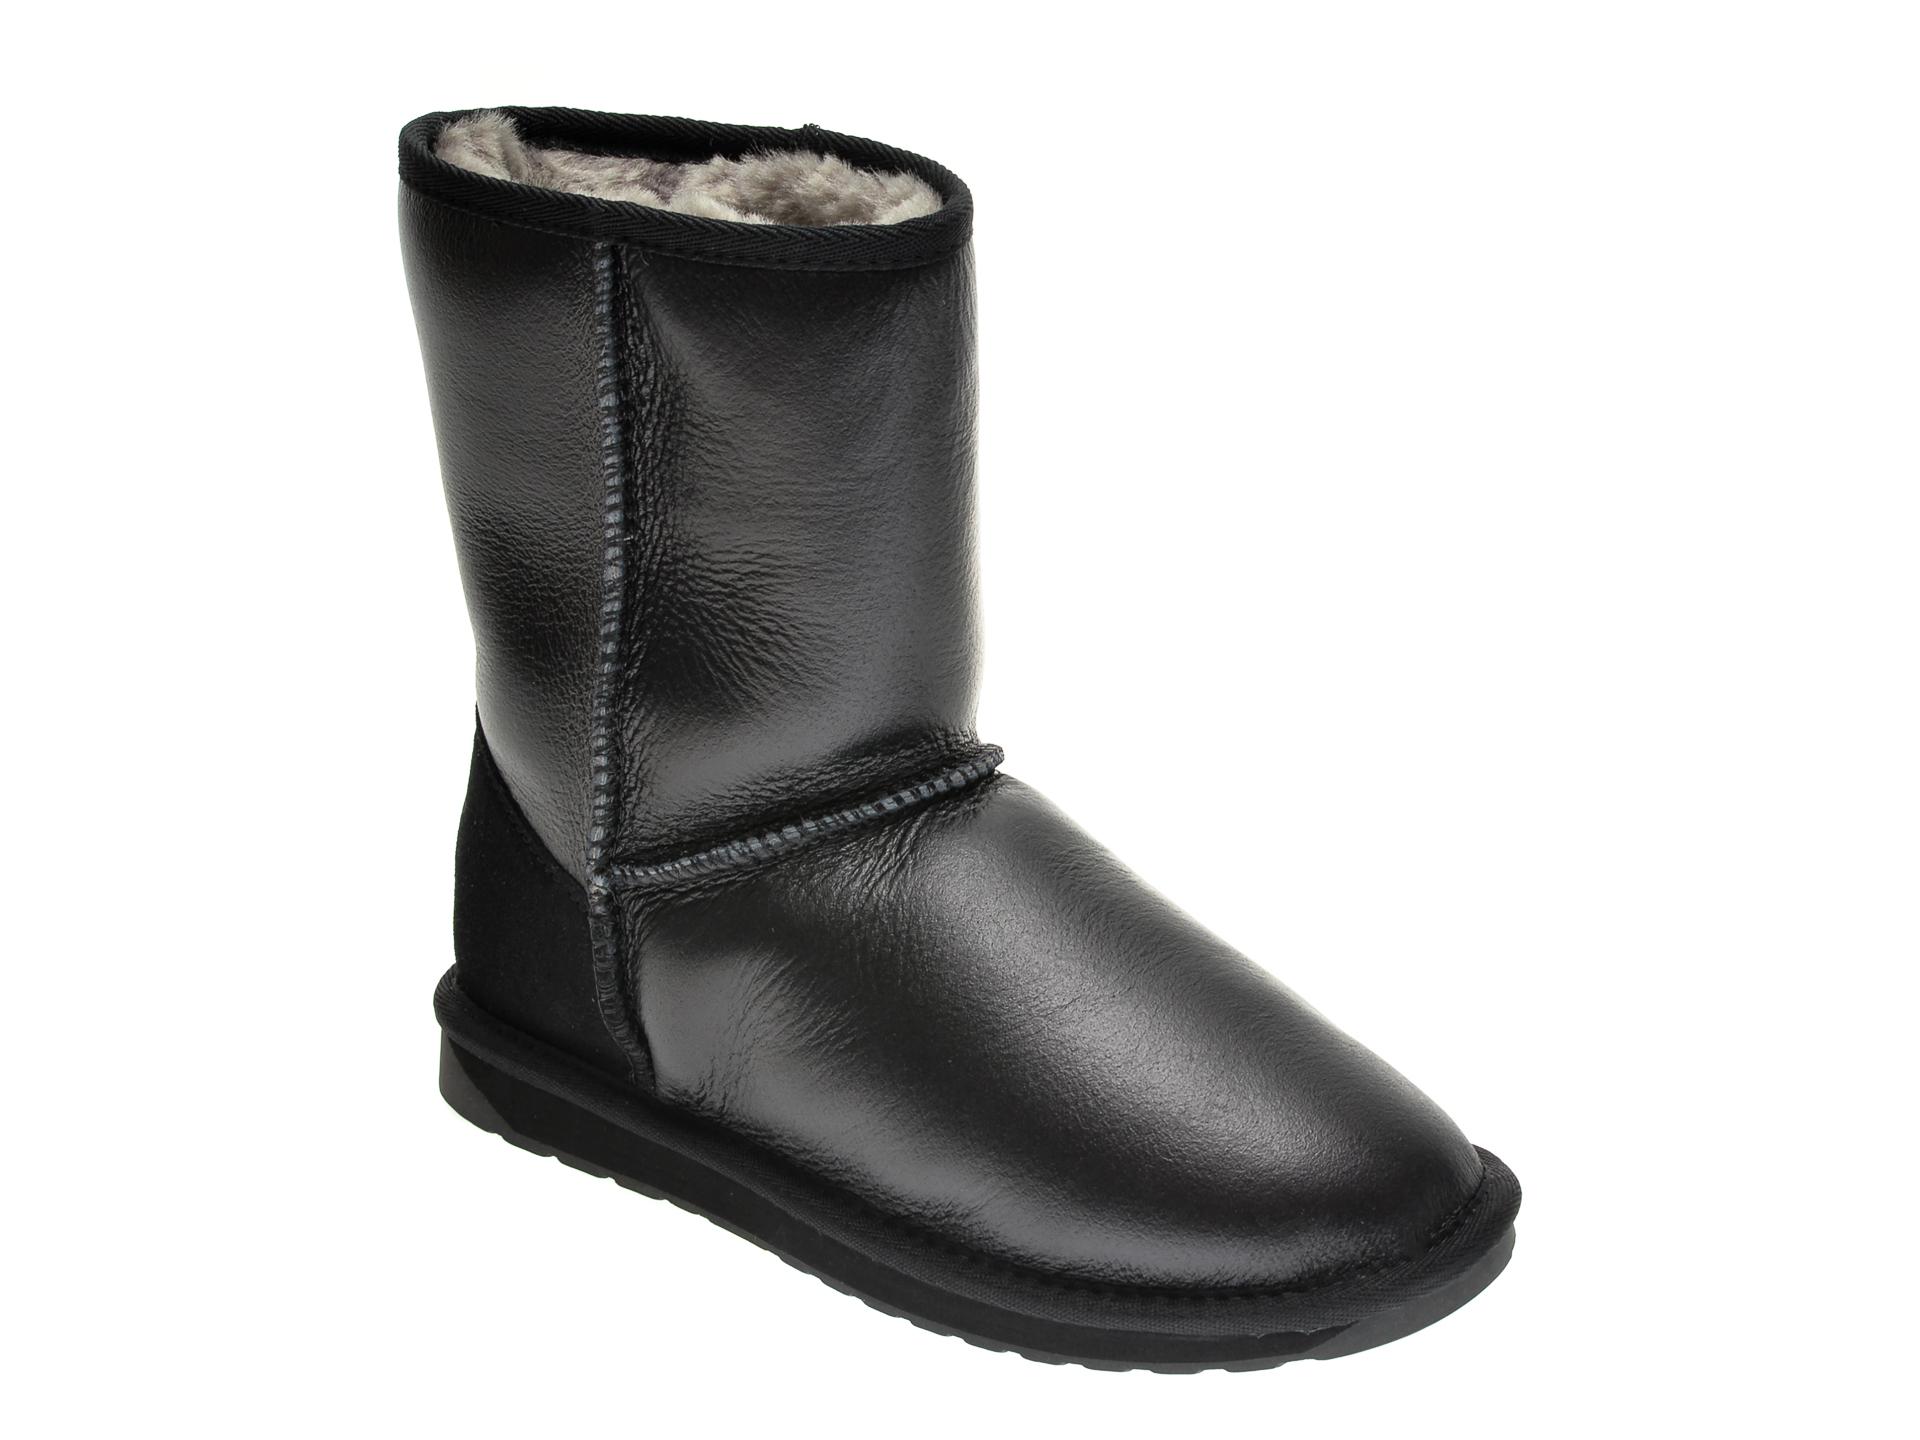 Ghete EMU negre, W10715, din piele naturala imagine otter.ro